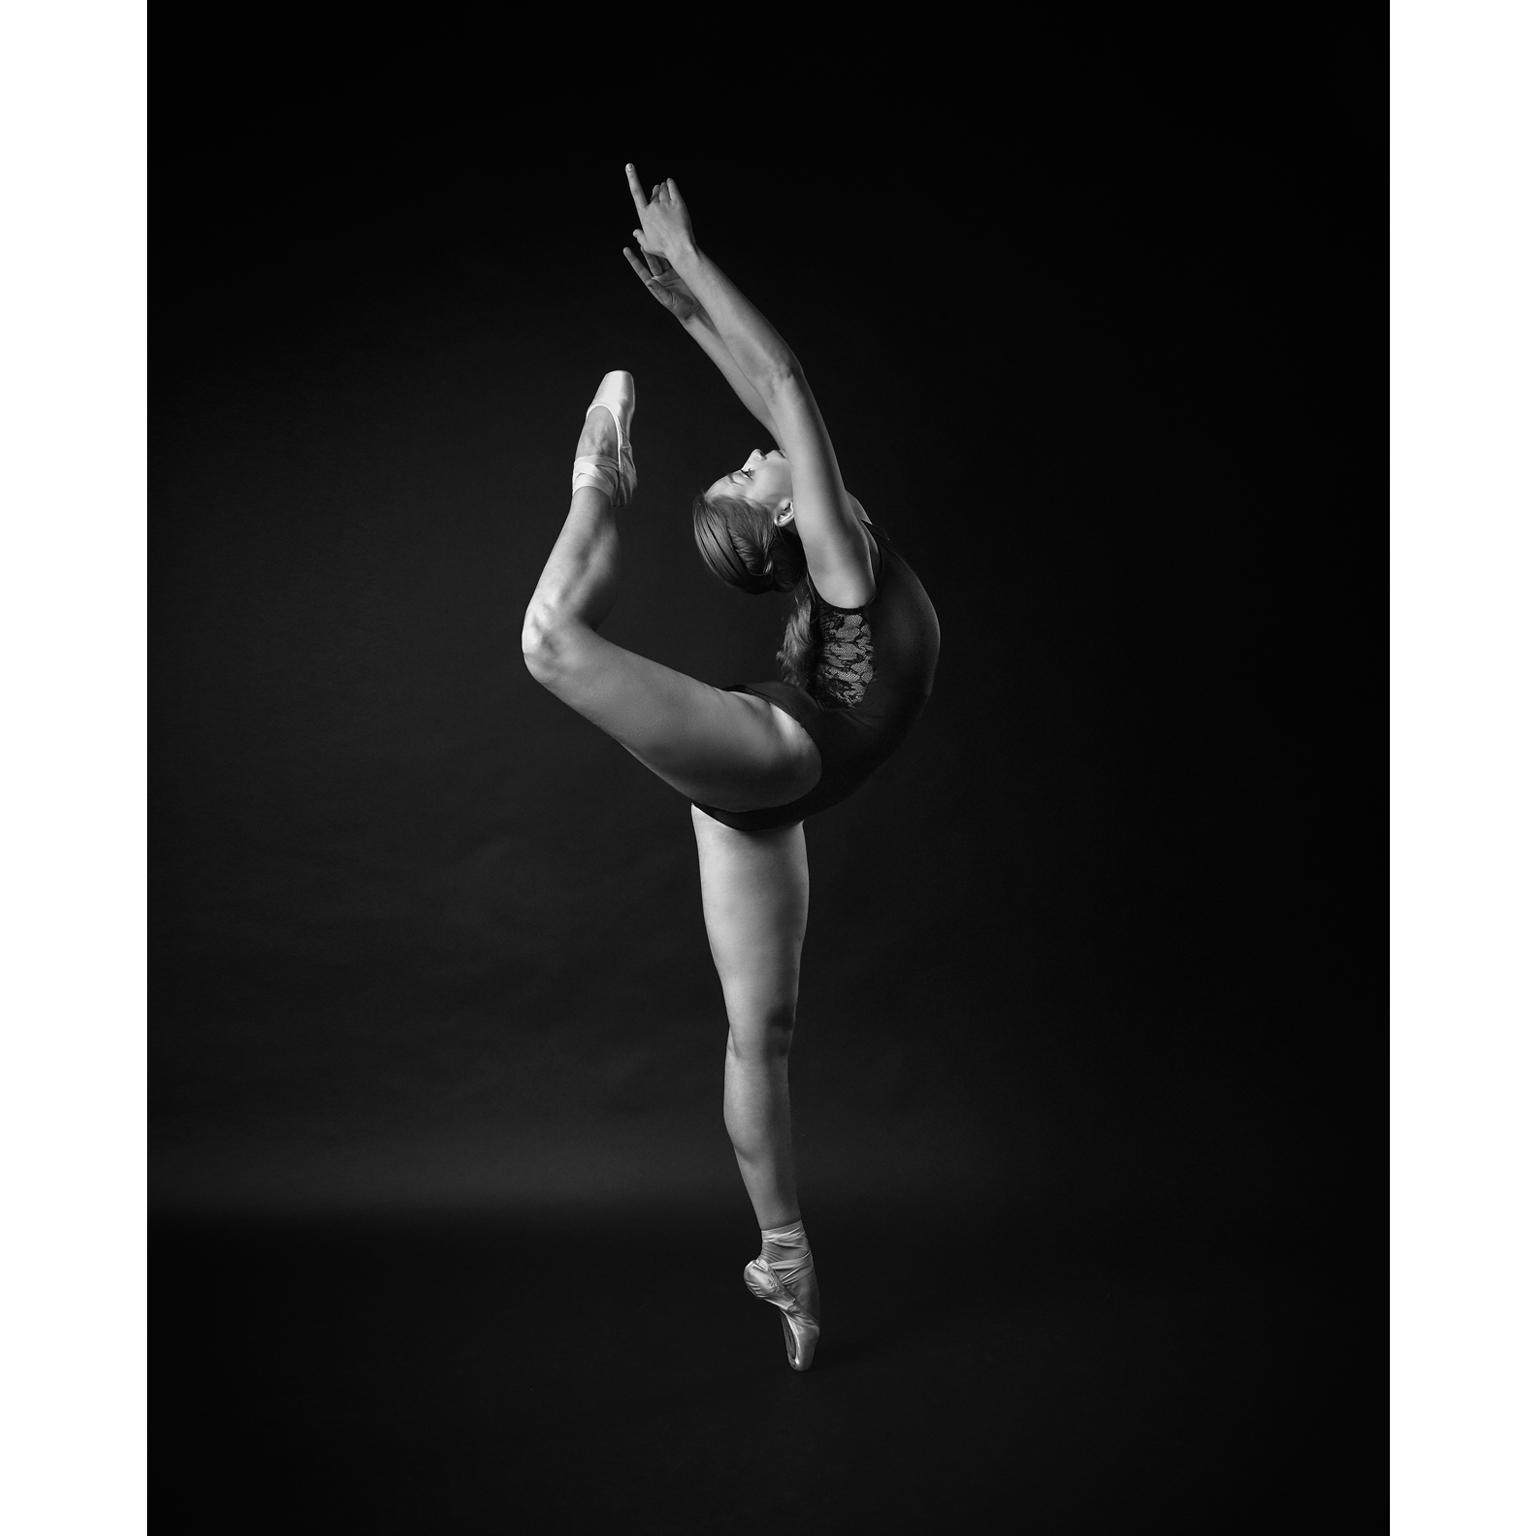 Toronto-Fitness-Model-Agency-Dancer-Ballerina-Elizabeth-Kalashnikova